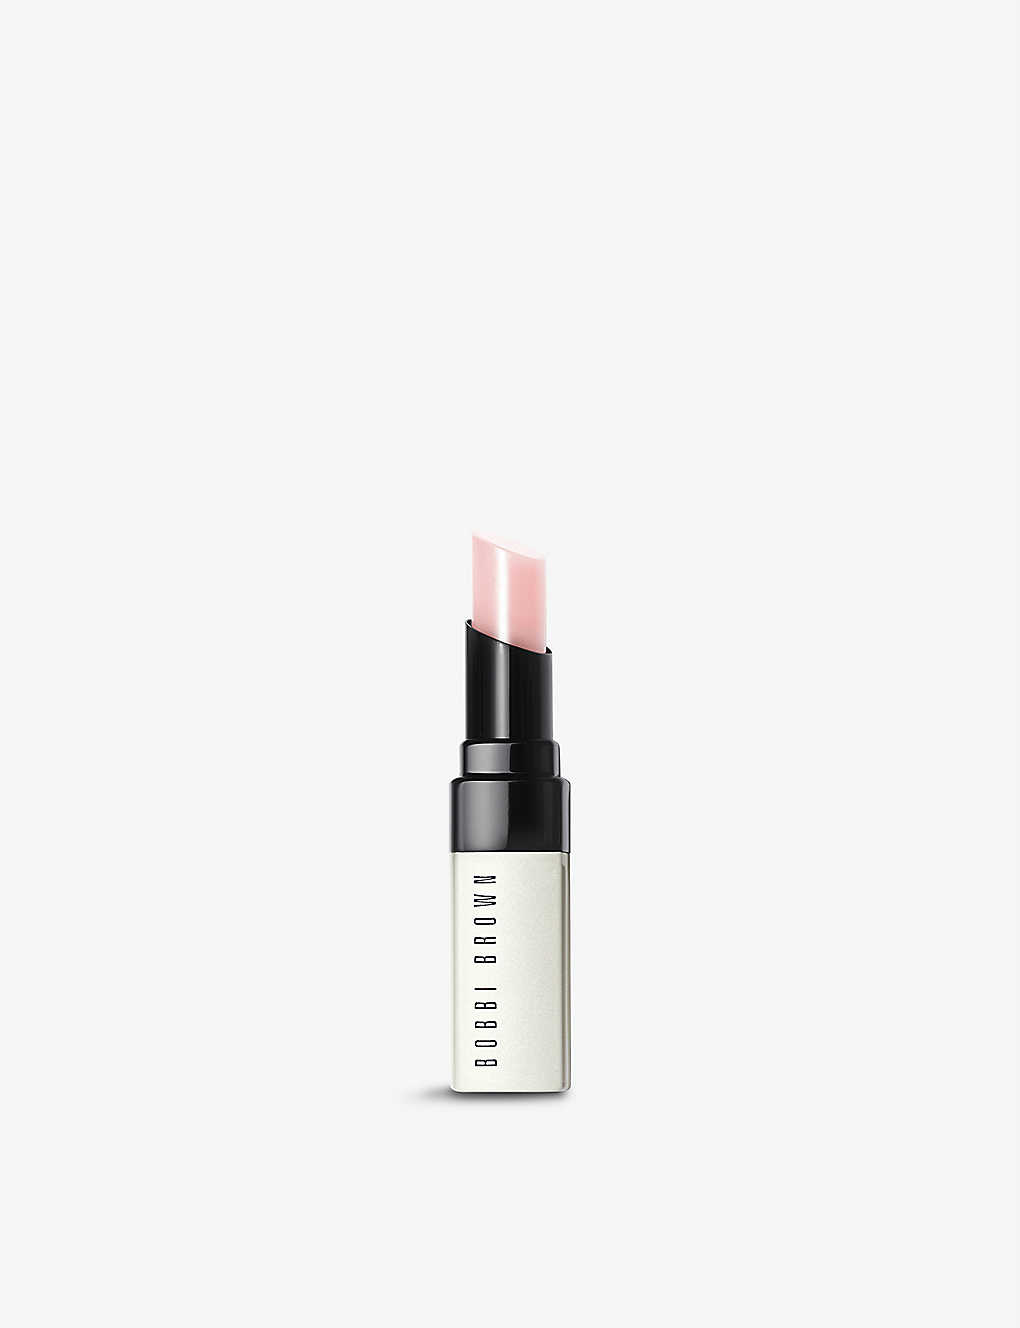 Bobbi Brown Extra Lip Tint In Bare Sparkle